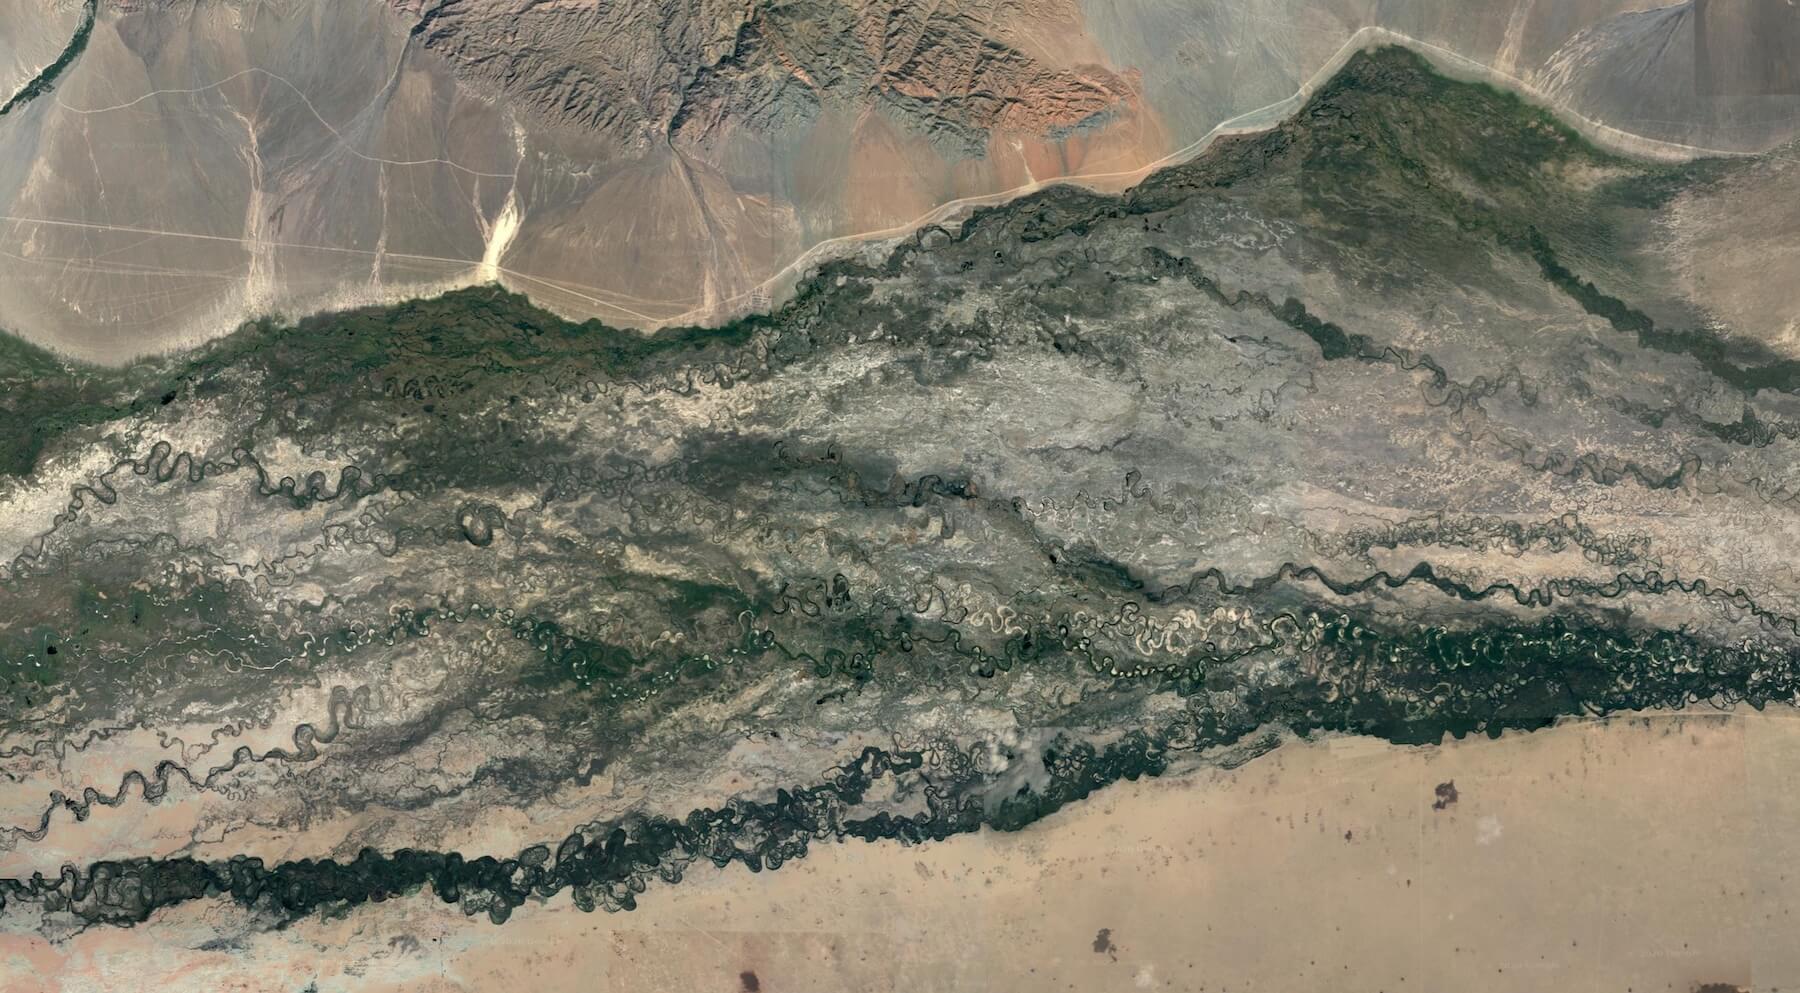 Tes River Basin